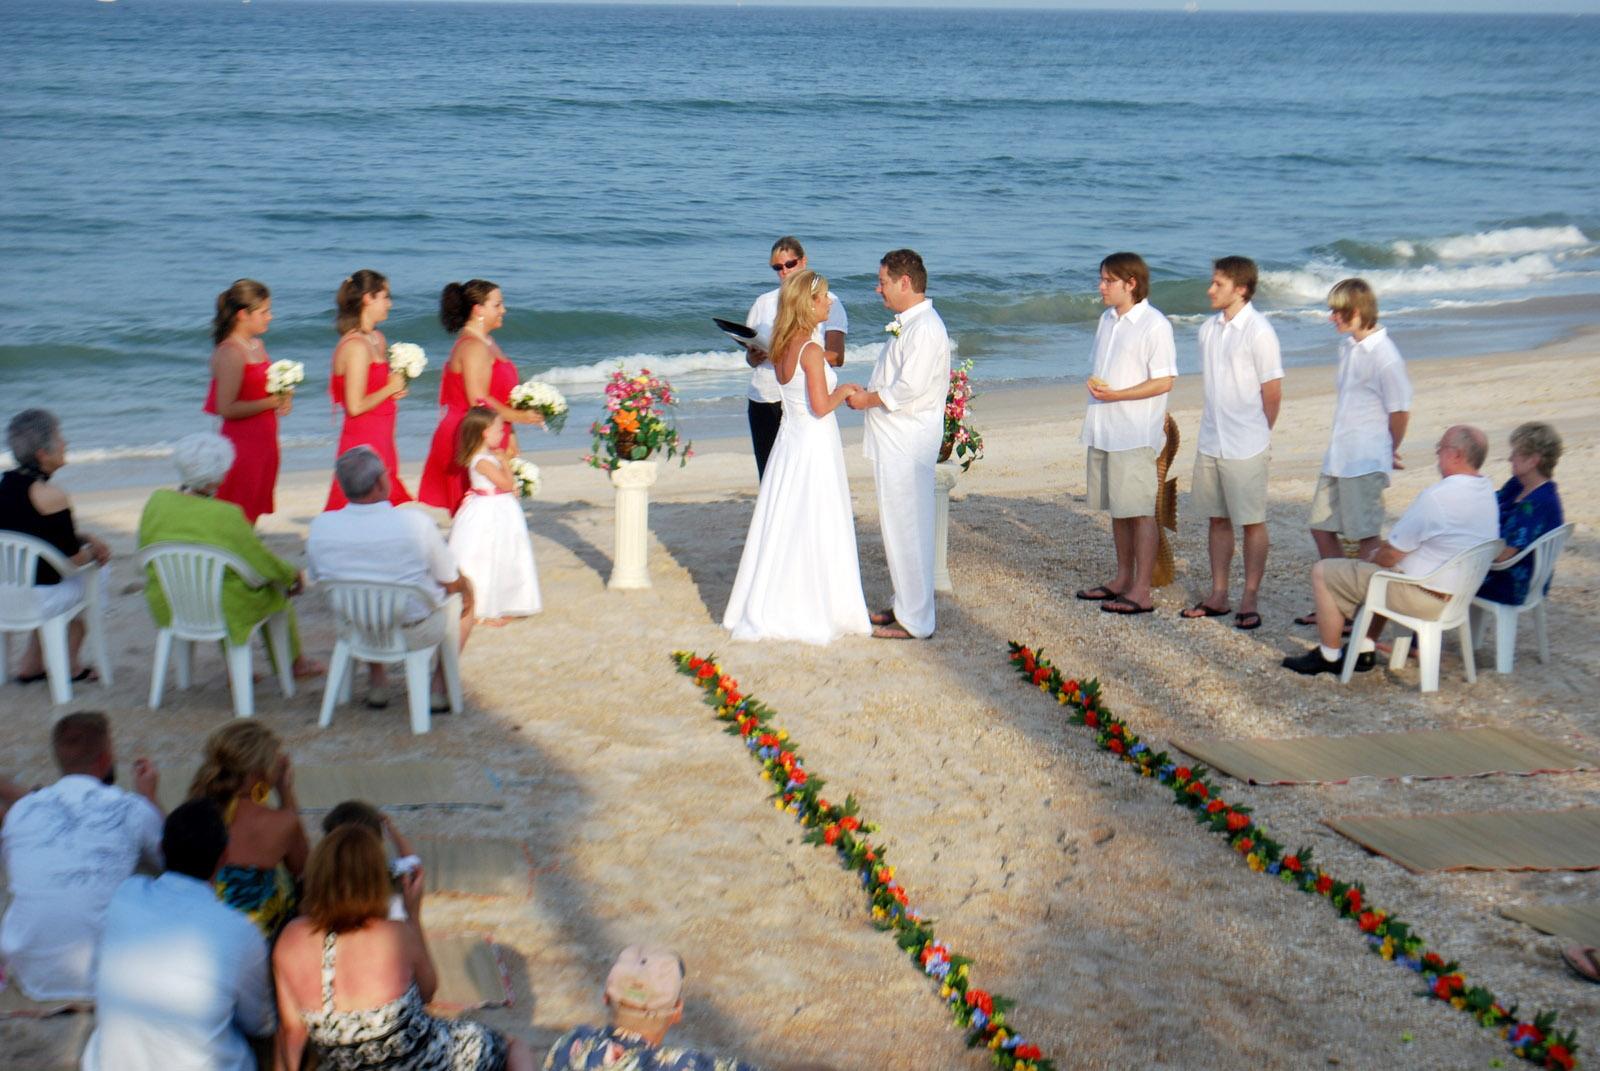 The Romantic & Inspiring Beach Wedding